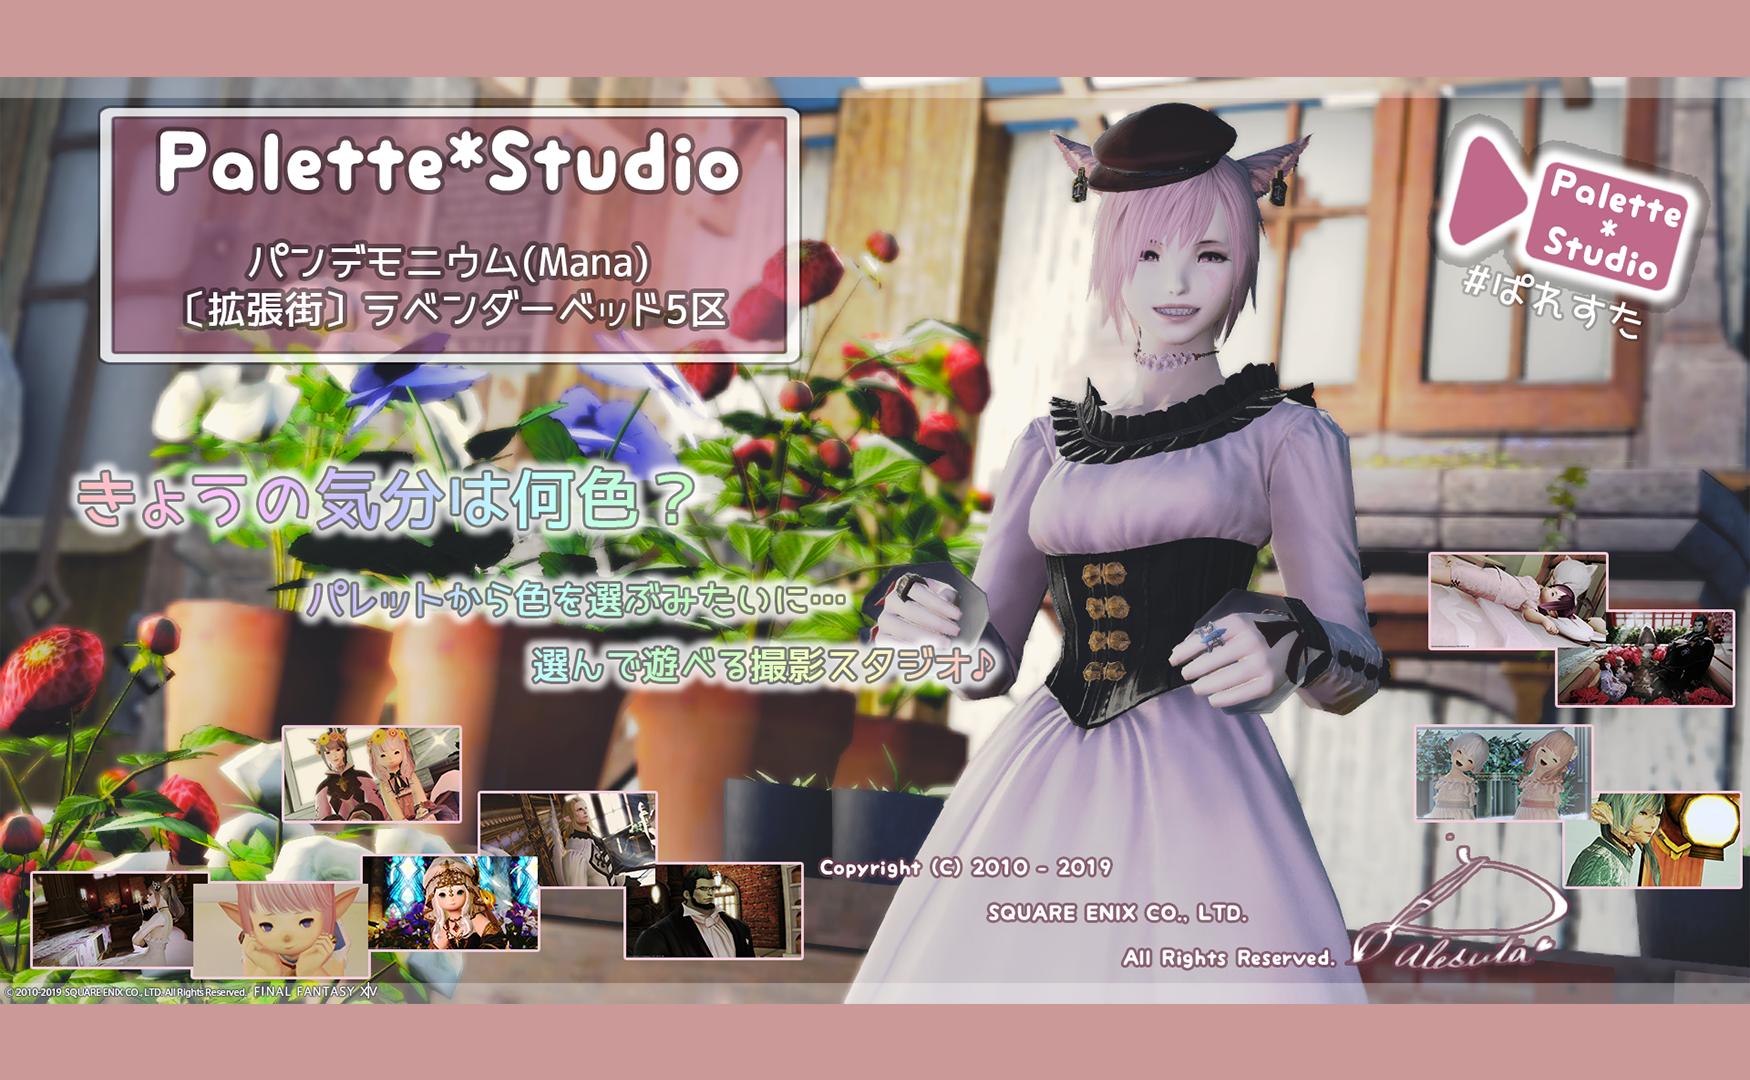 Palette Studio